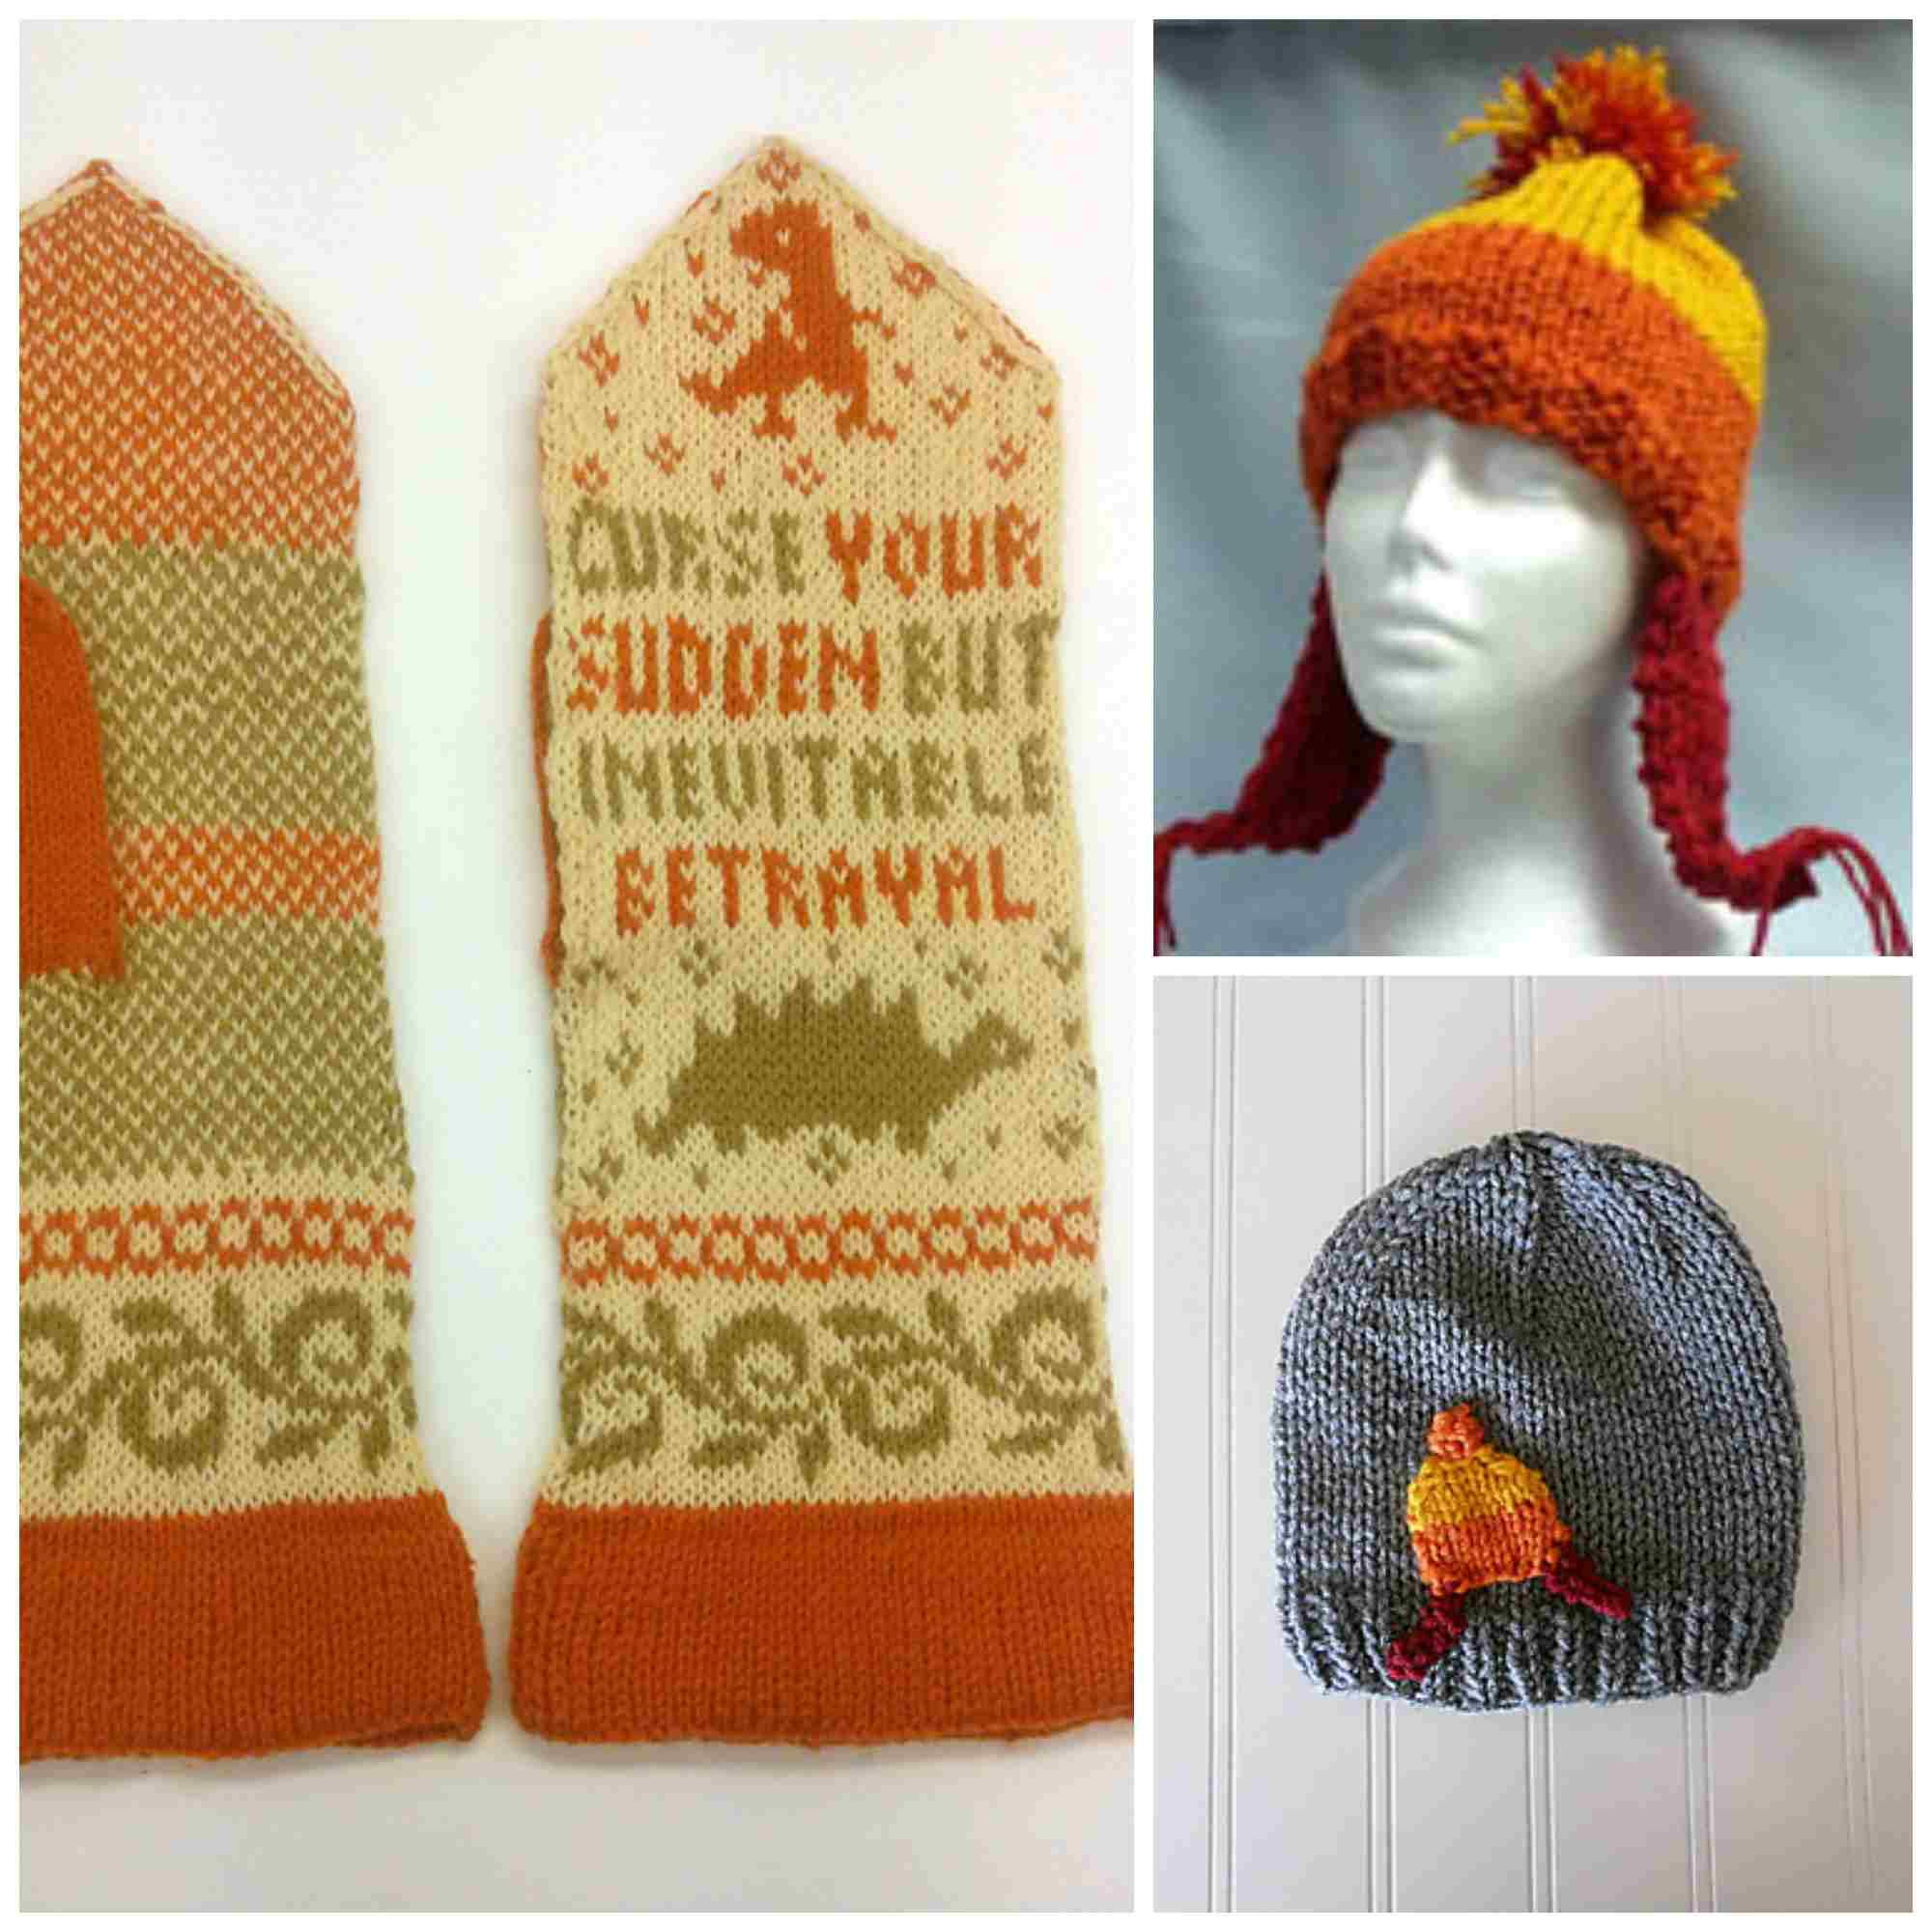 Must-Knit Geek Knitting Patterns